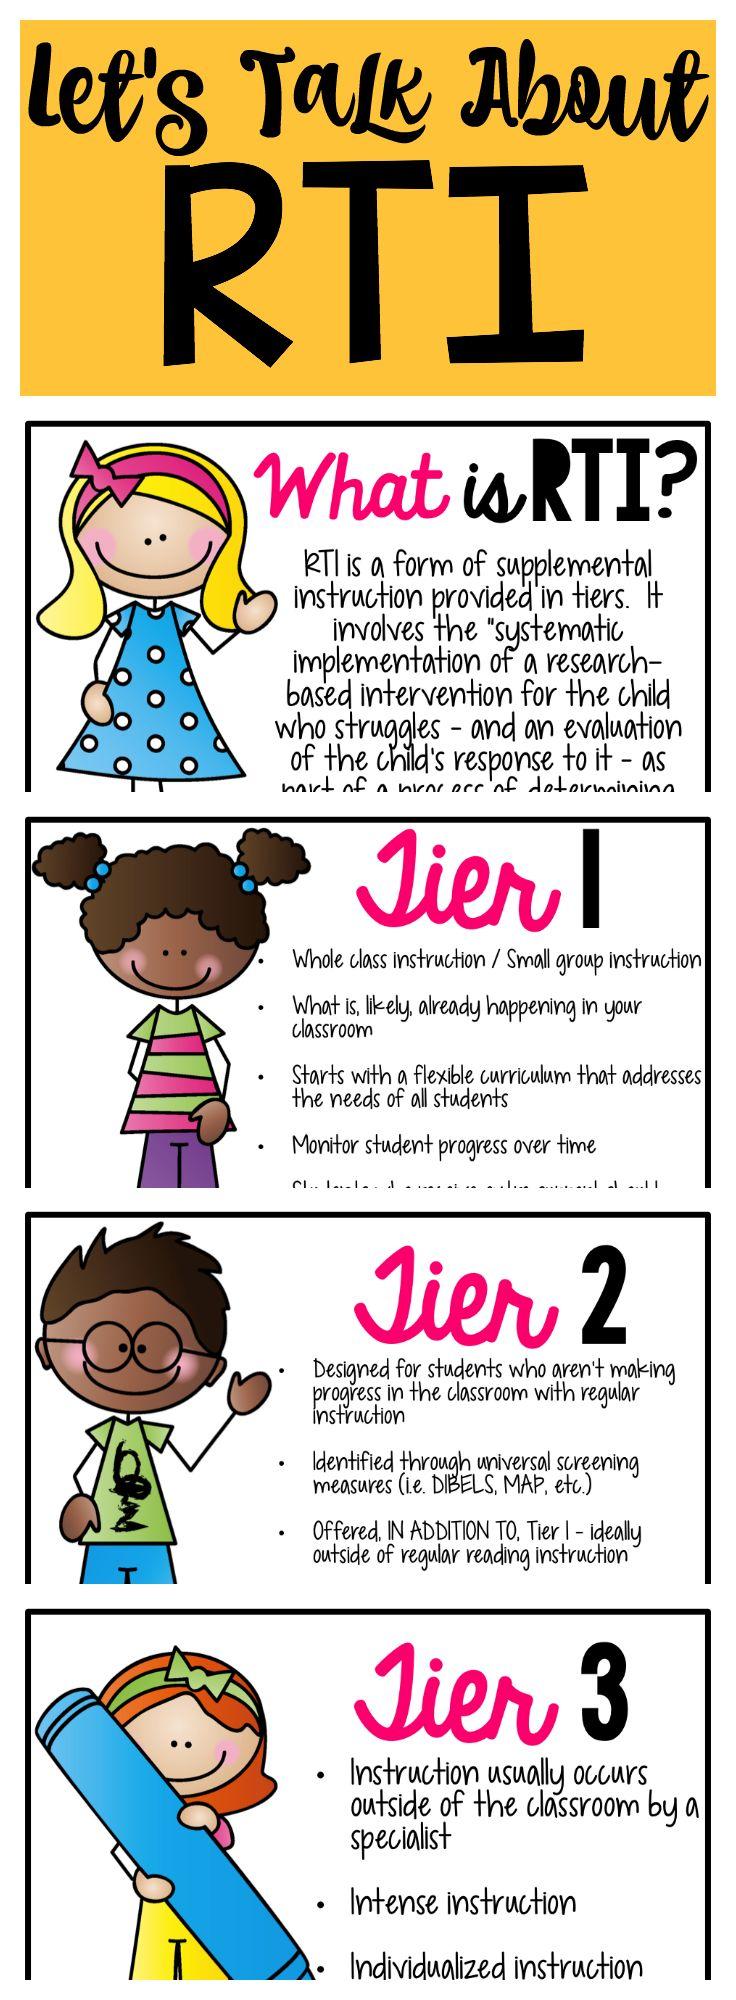 best images about school ideas on pinterest